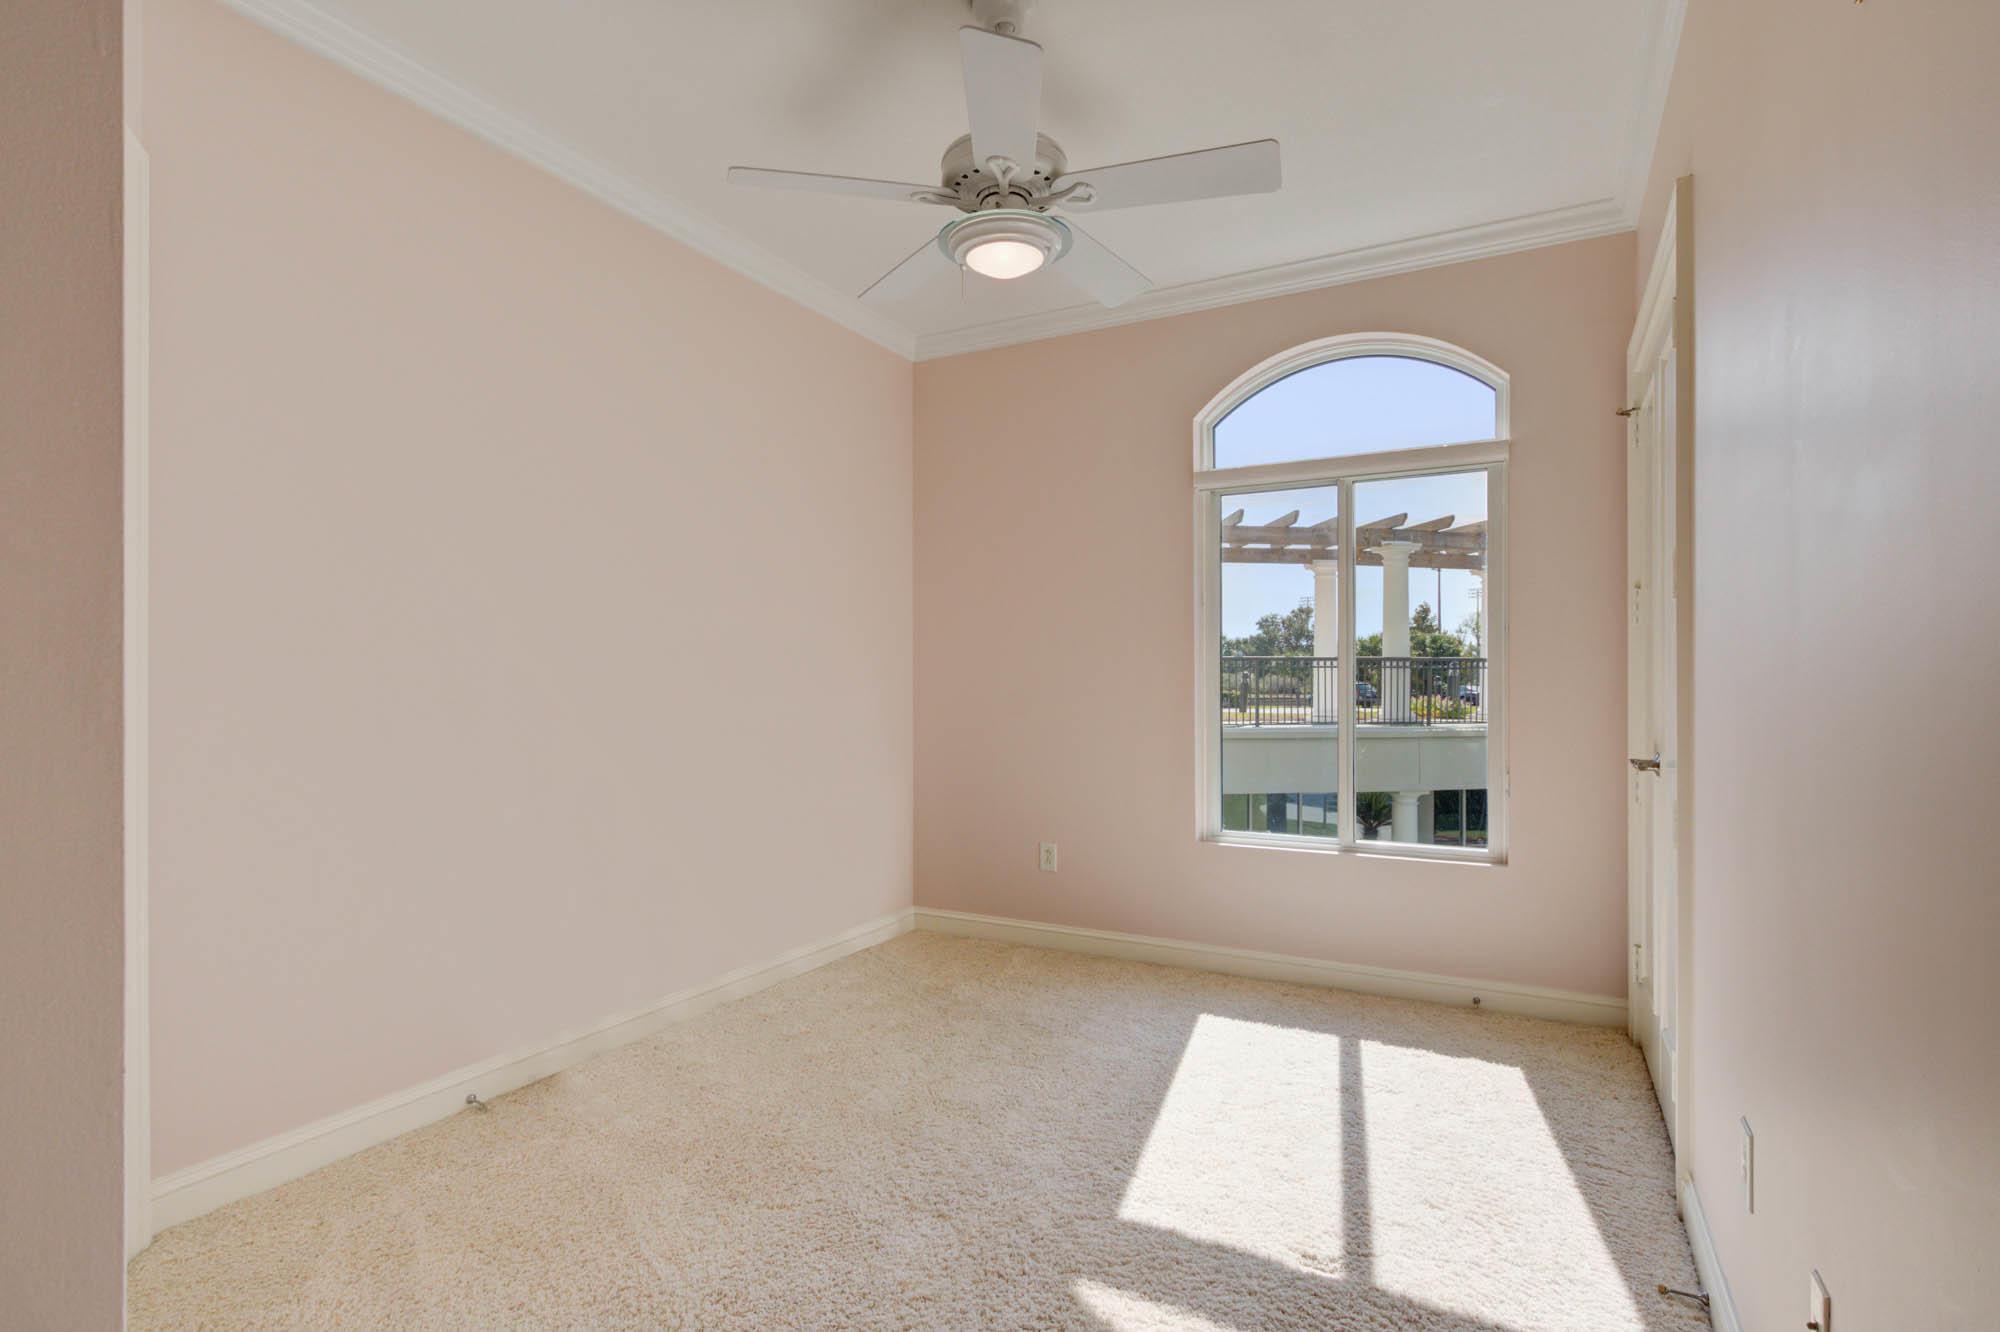 Renaissance On Chas Harbor Homes For Sale - 125 Plaza, Mount Pleasant, SC - 41